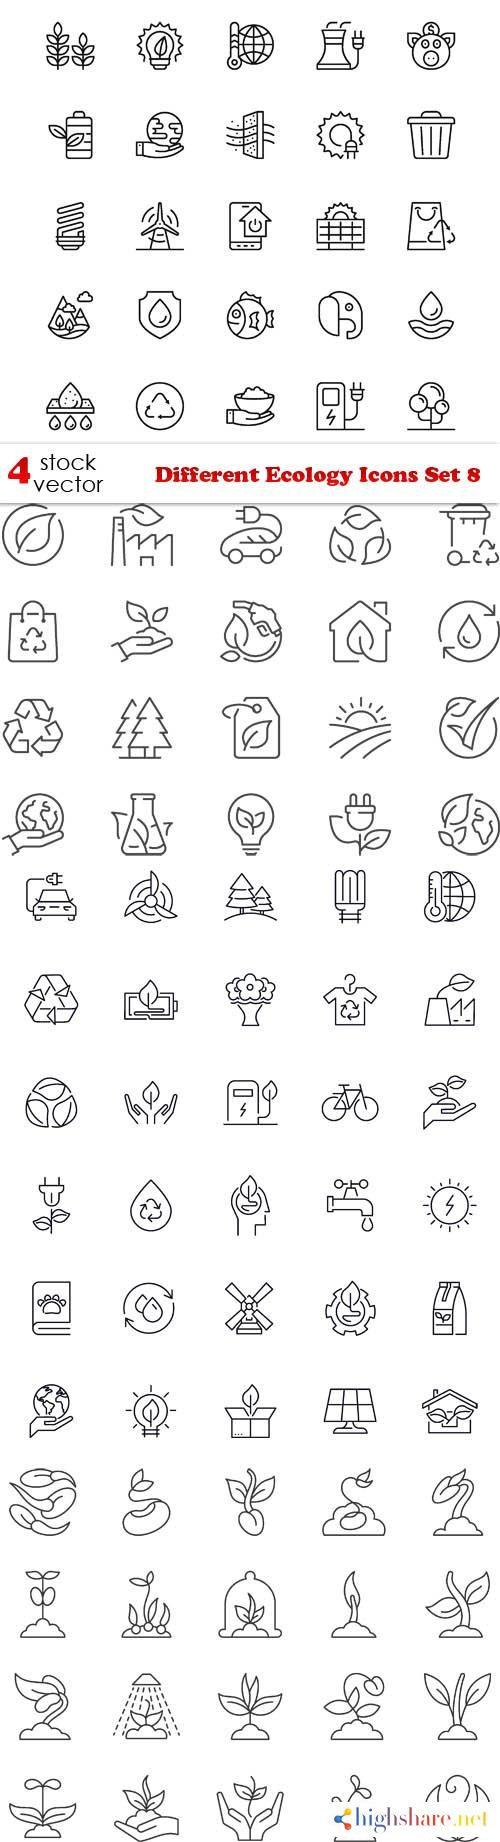 vectors different ecology icons set 8 5f3fc8cfb4411 - Vectors - Different Ecology Icons Set 8